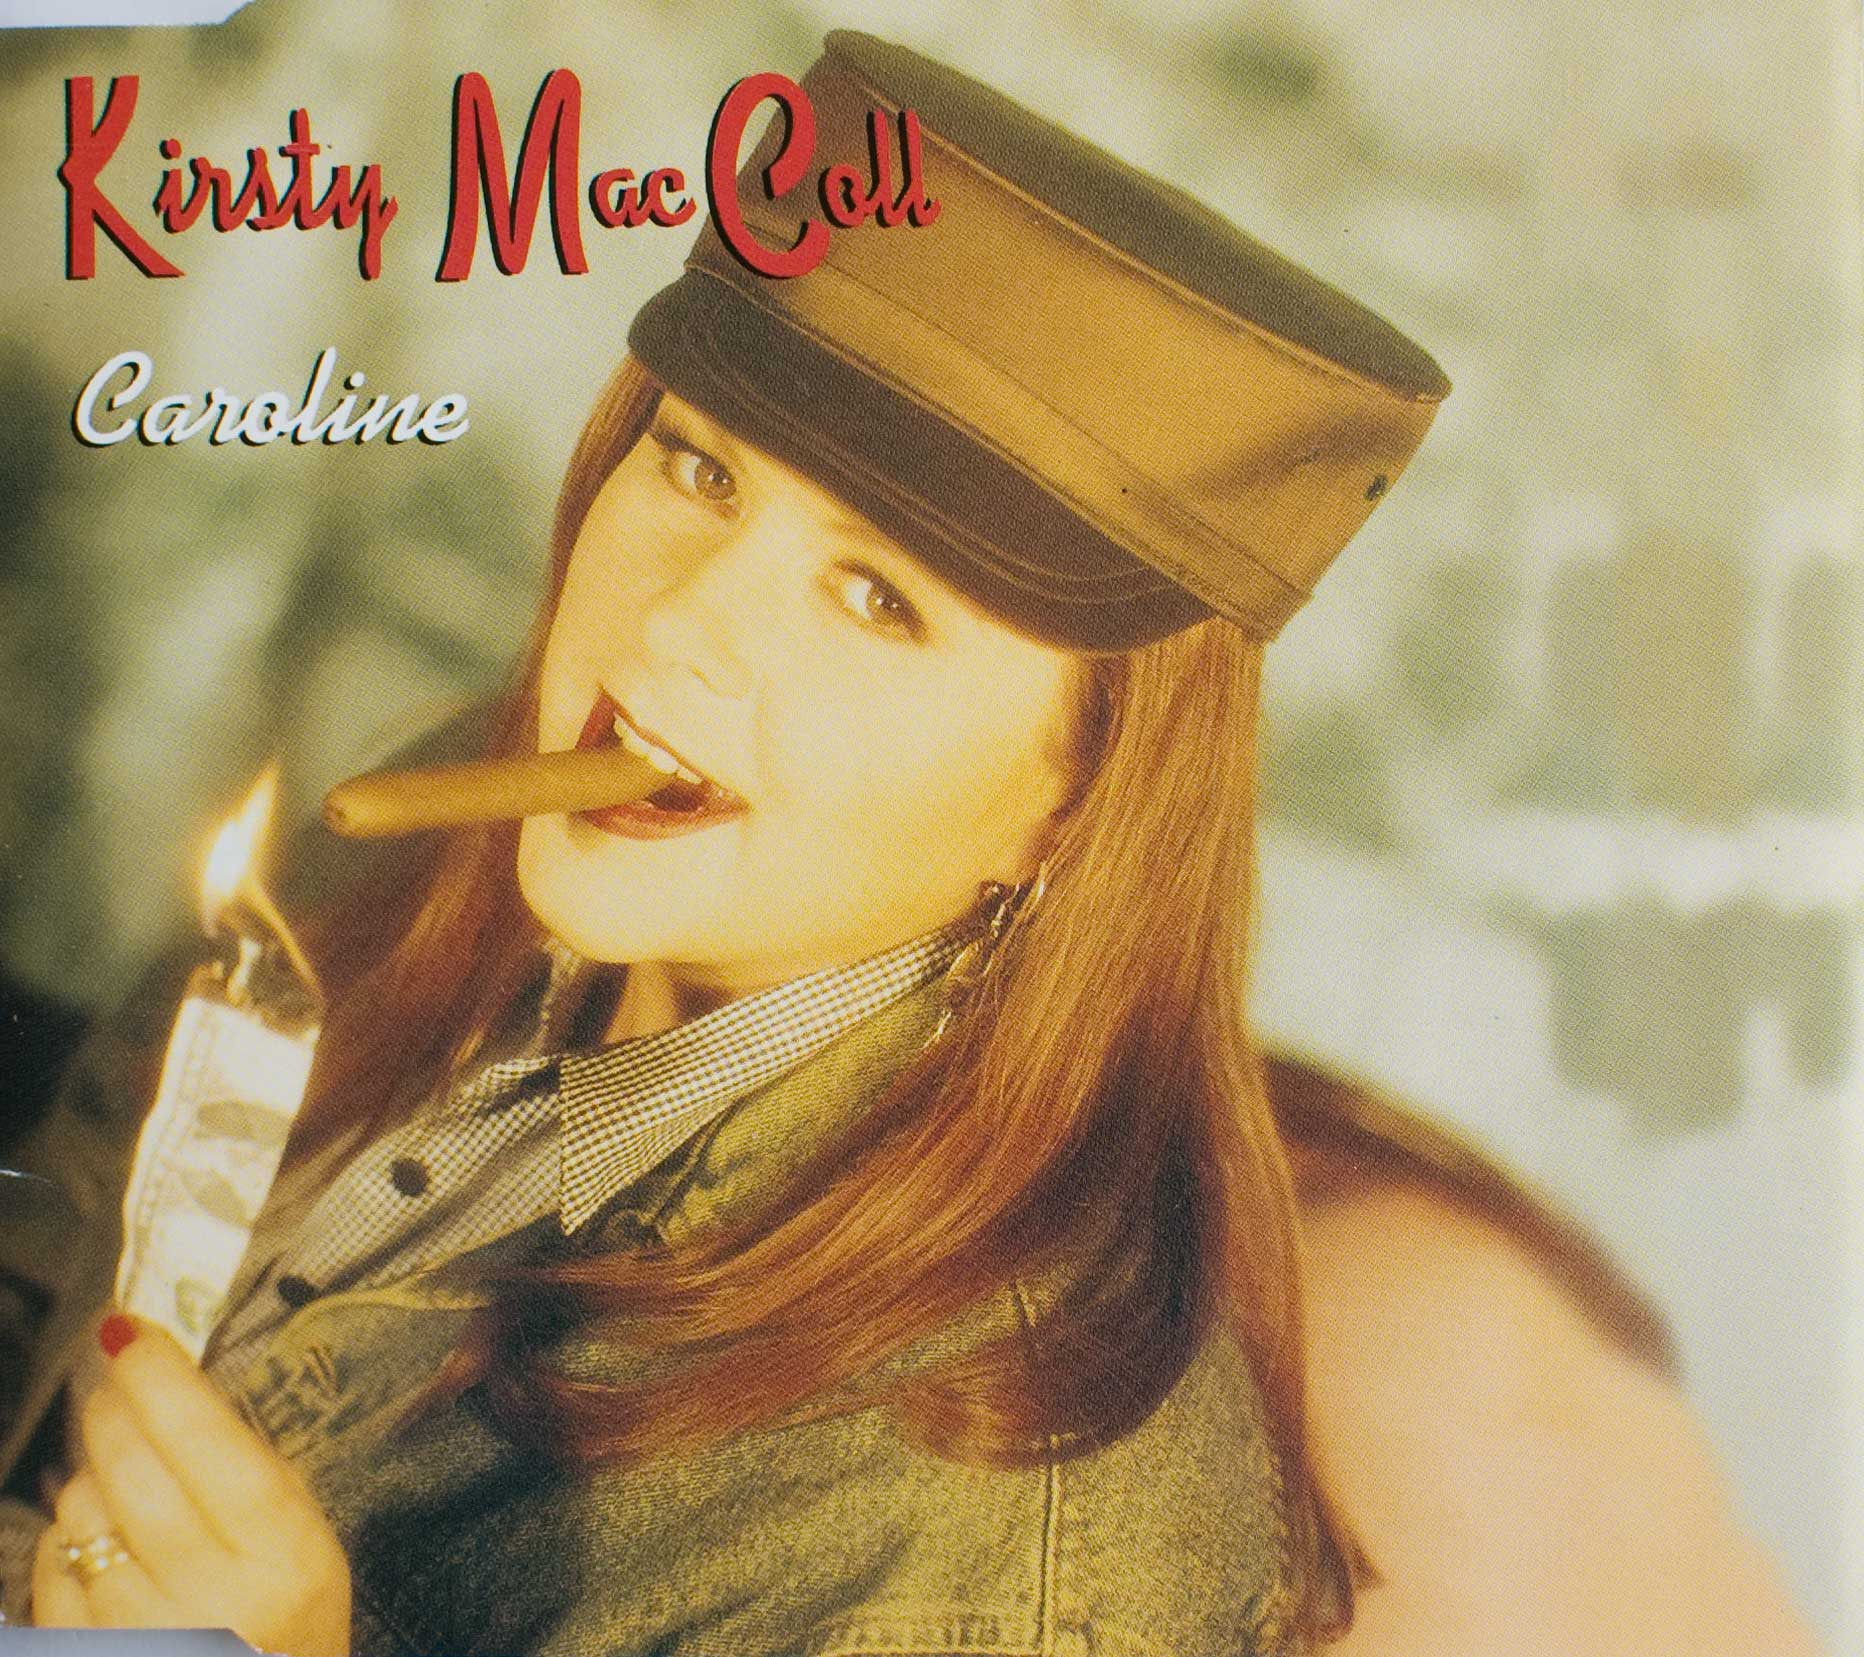 Caroline (CD single 2) front cover